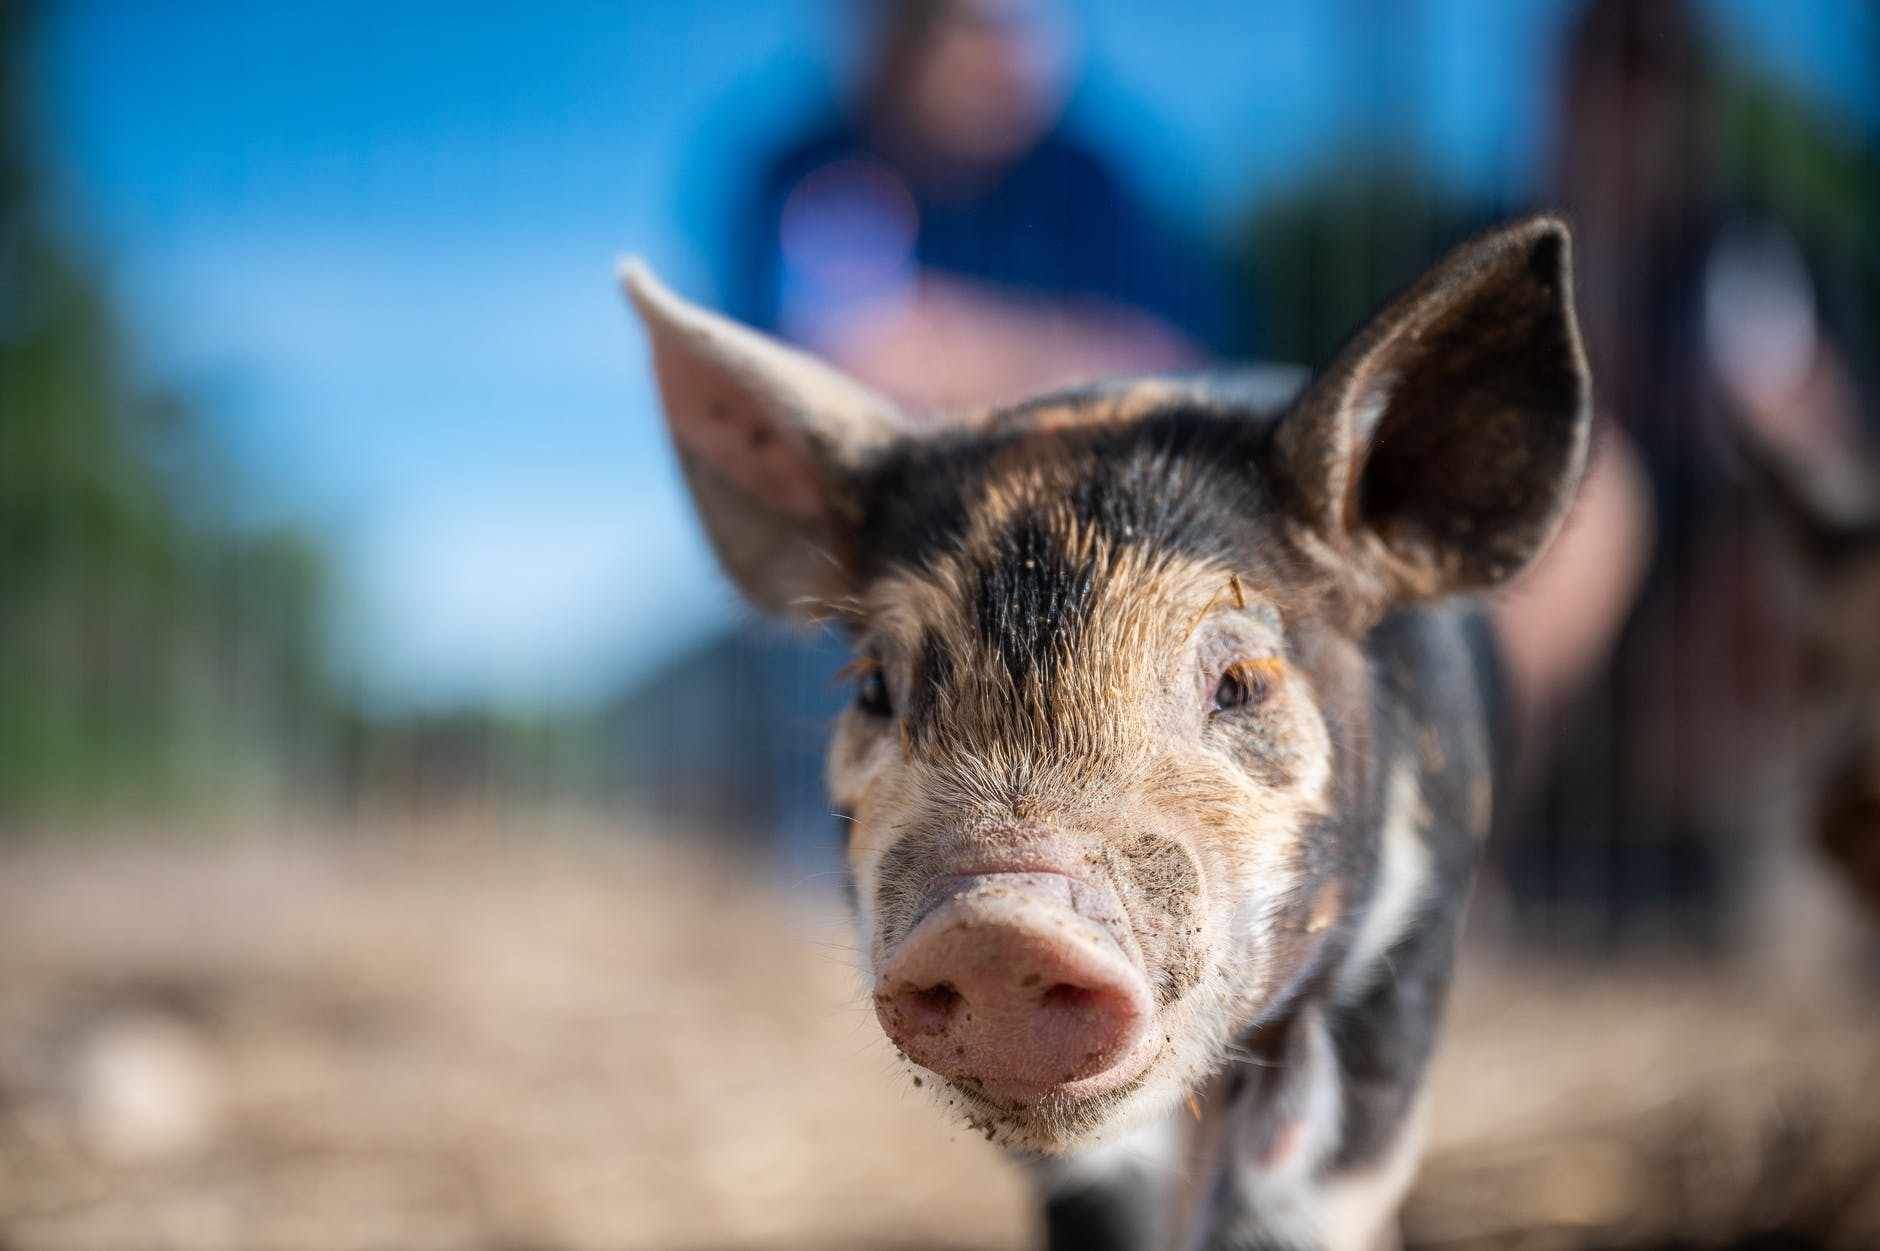 curious little piglet walking on sunny farmland